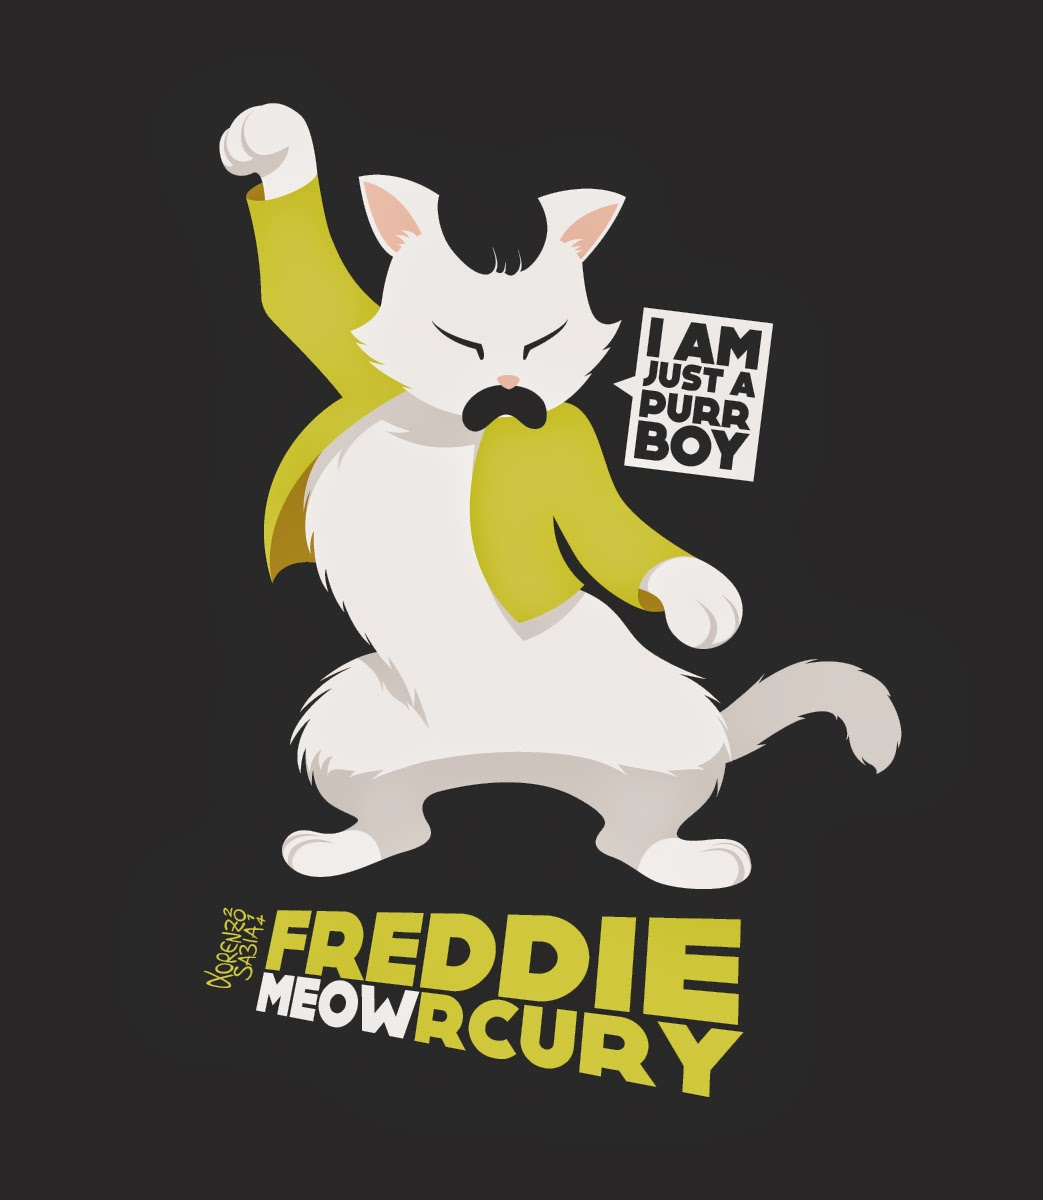 Freddy Meowrcury by Lorenzo Sabia